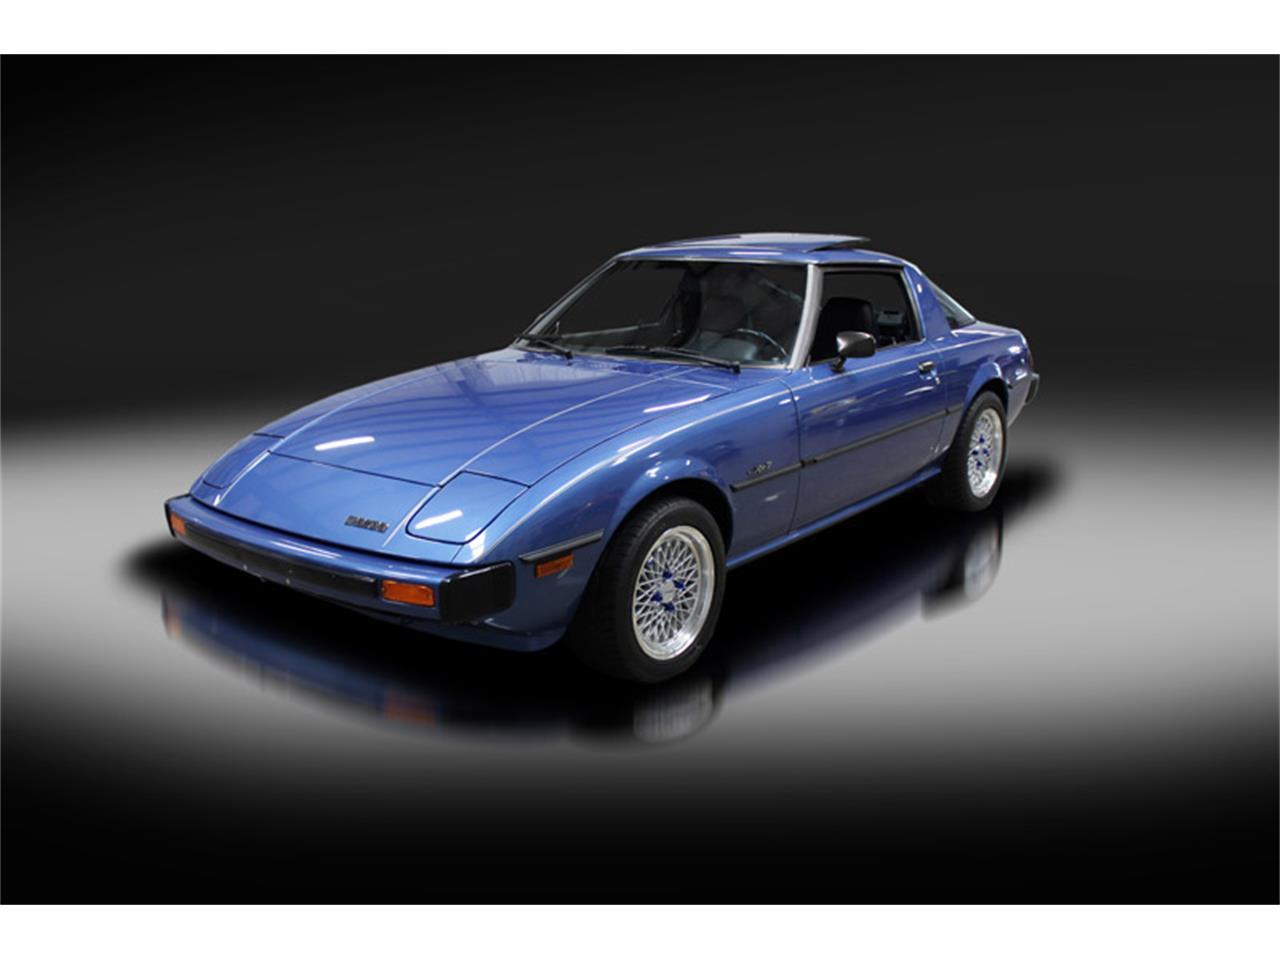 1979 Mazda Rx 7 For Sale Classiccars Com Cc 1040365